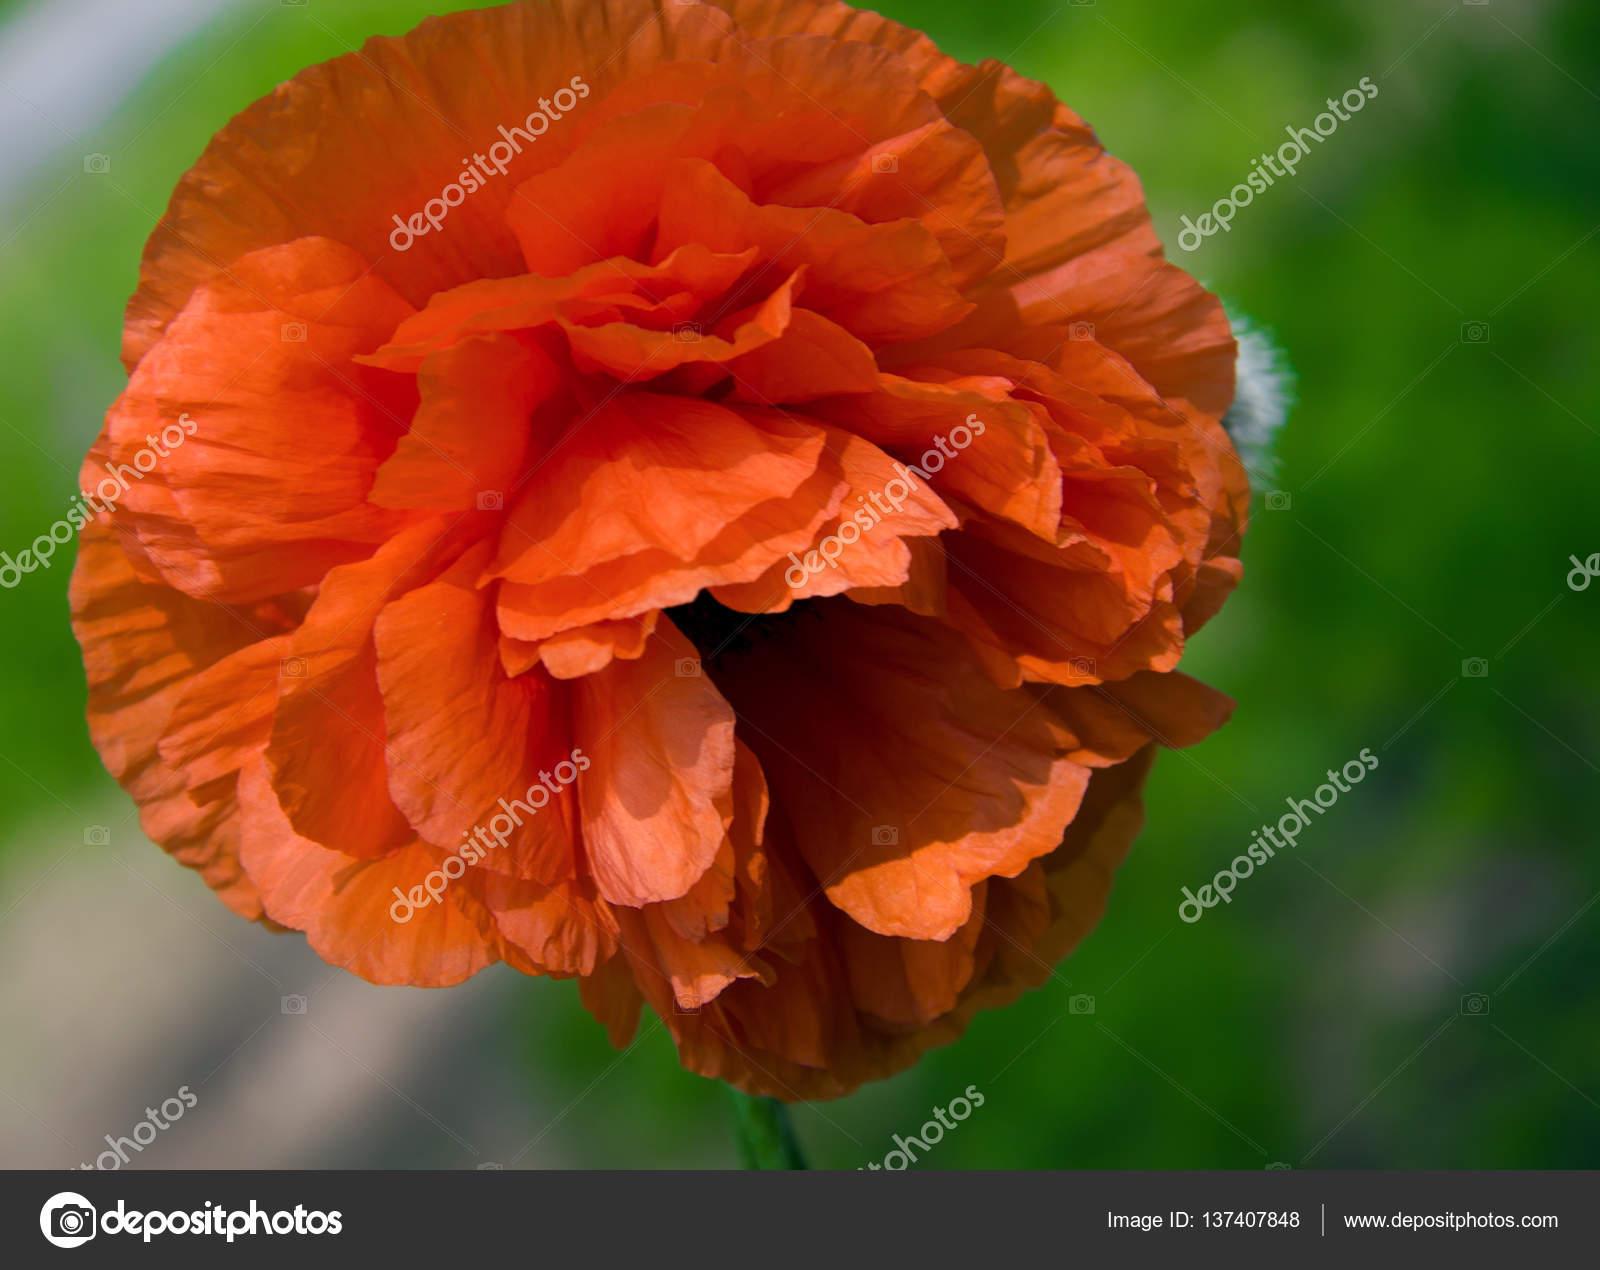 Red Poppy Flower With A Bud Closeup Stock Photo Kolesnikovserg